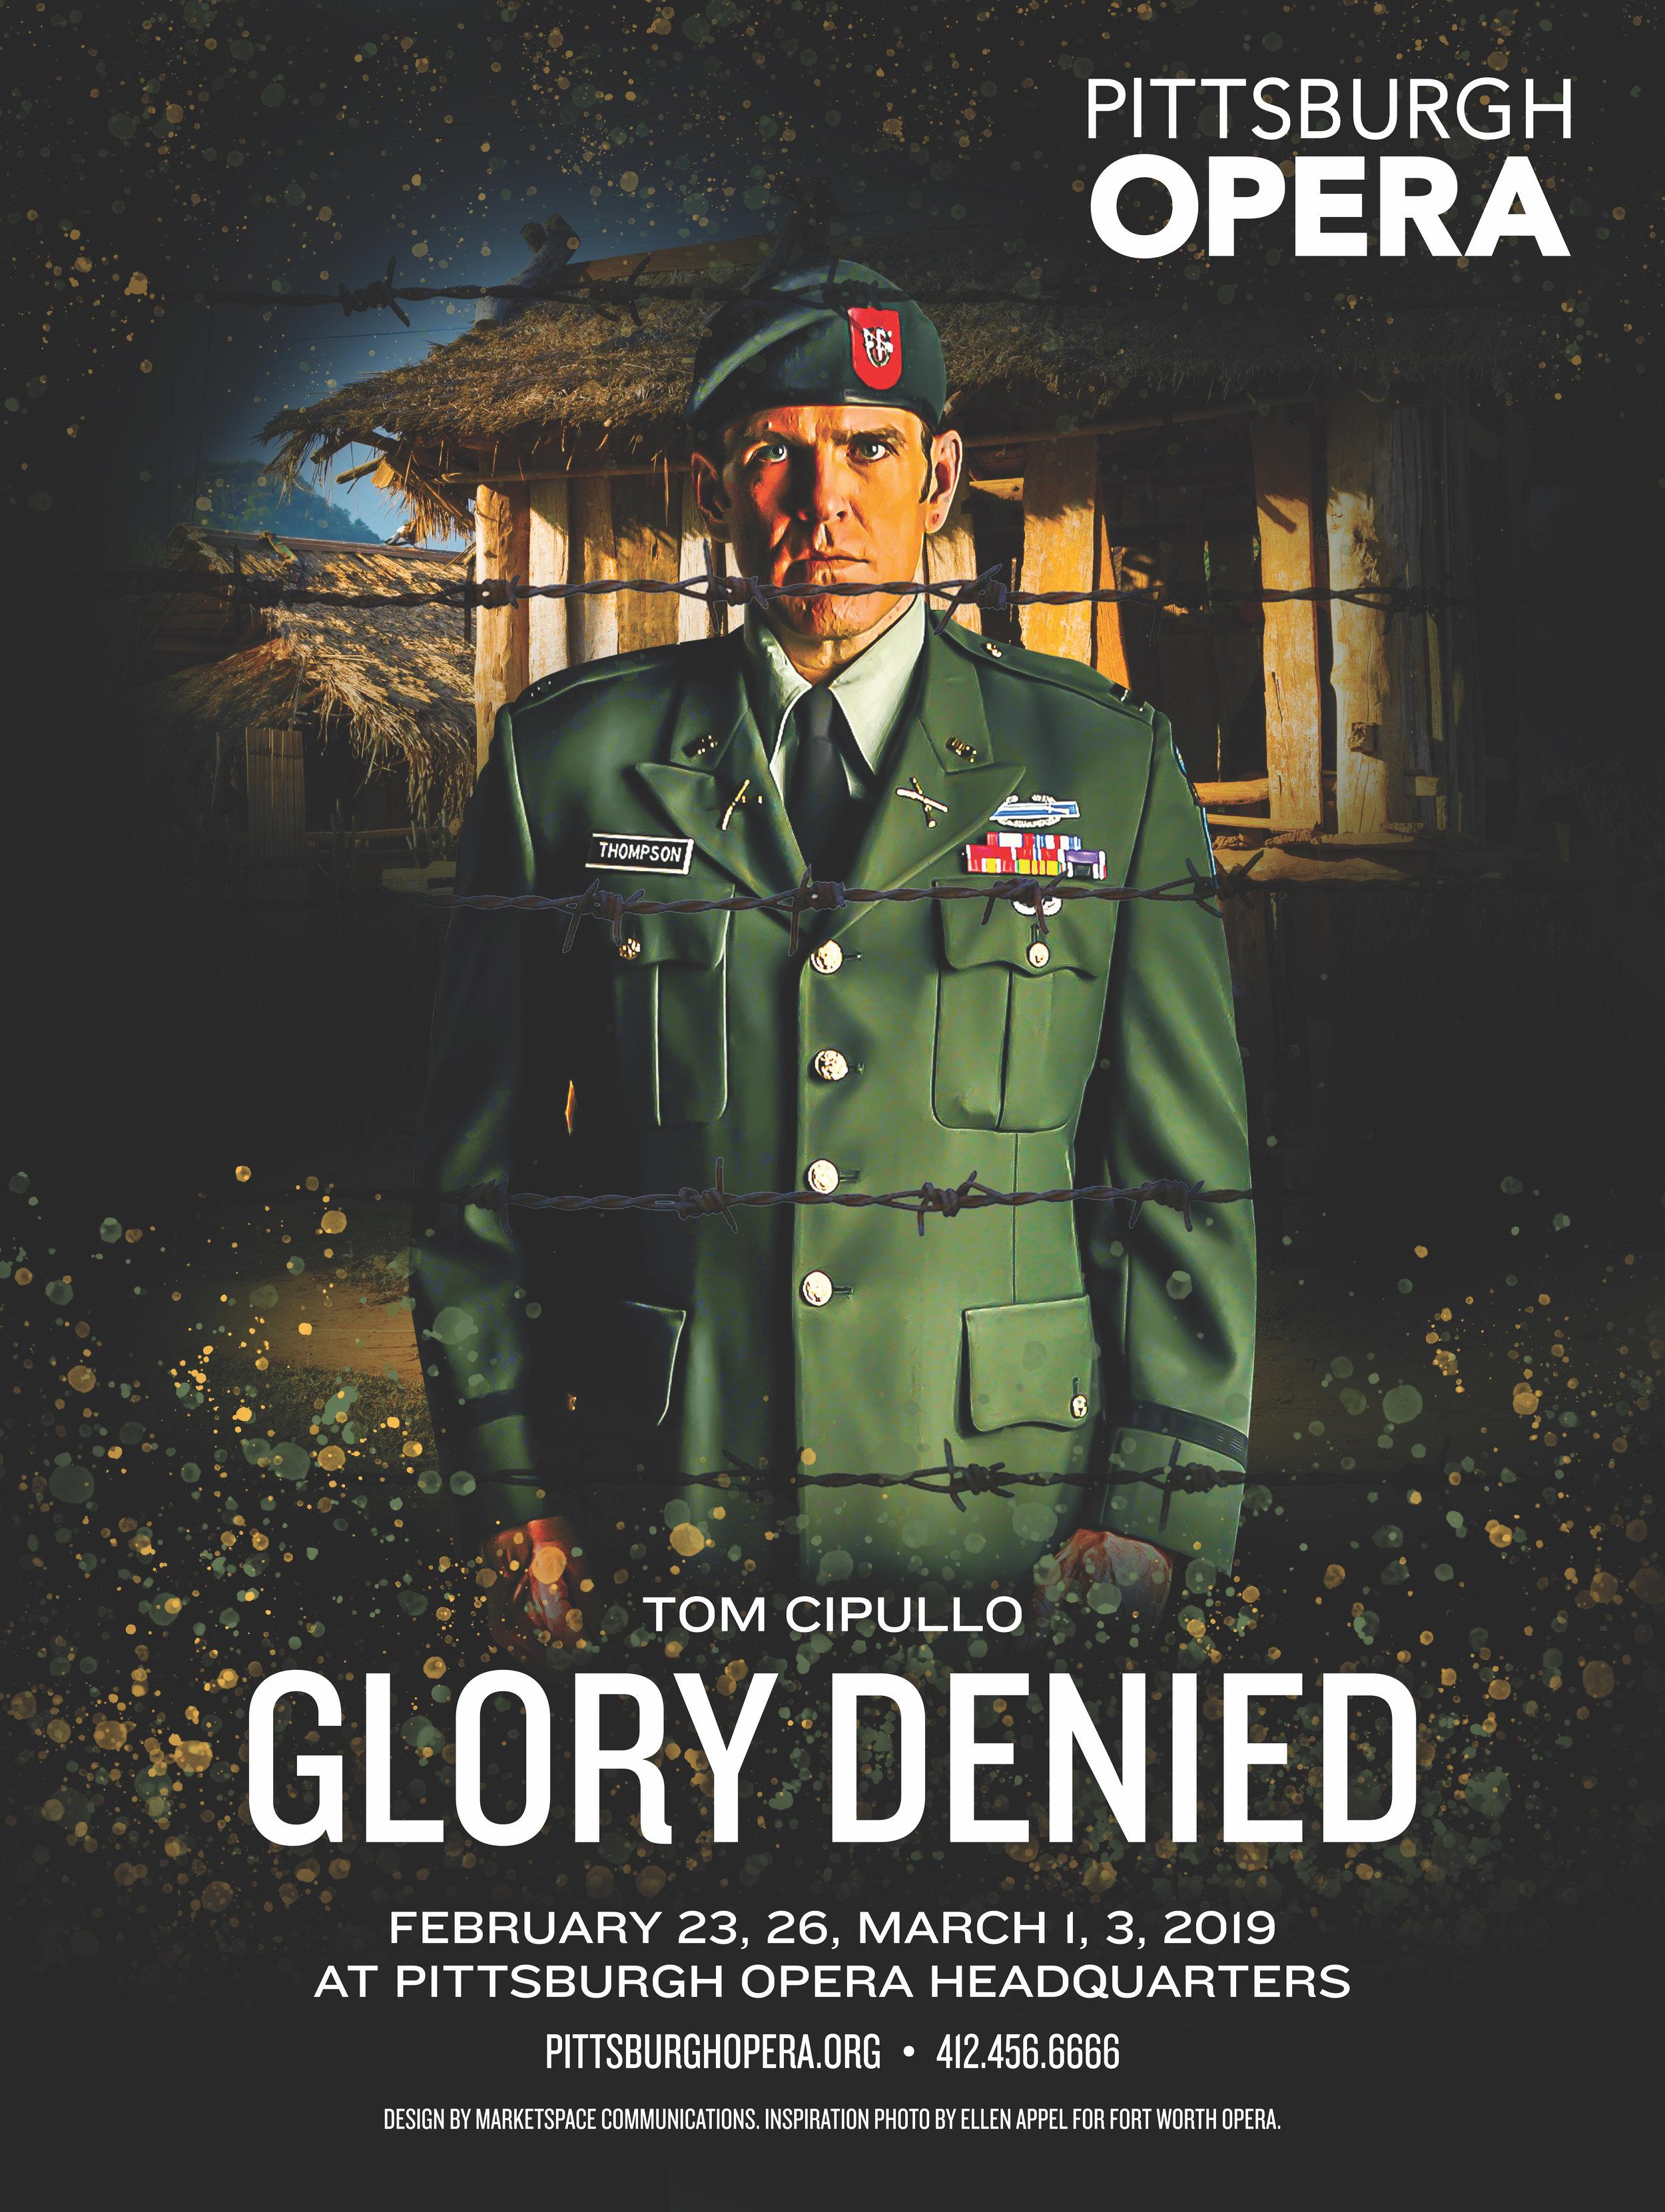 Glory_Denied_Final_rastered_CMYK.jpg